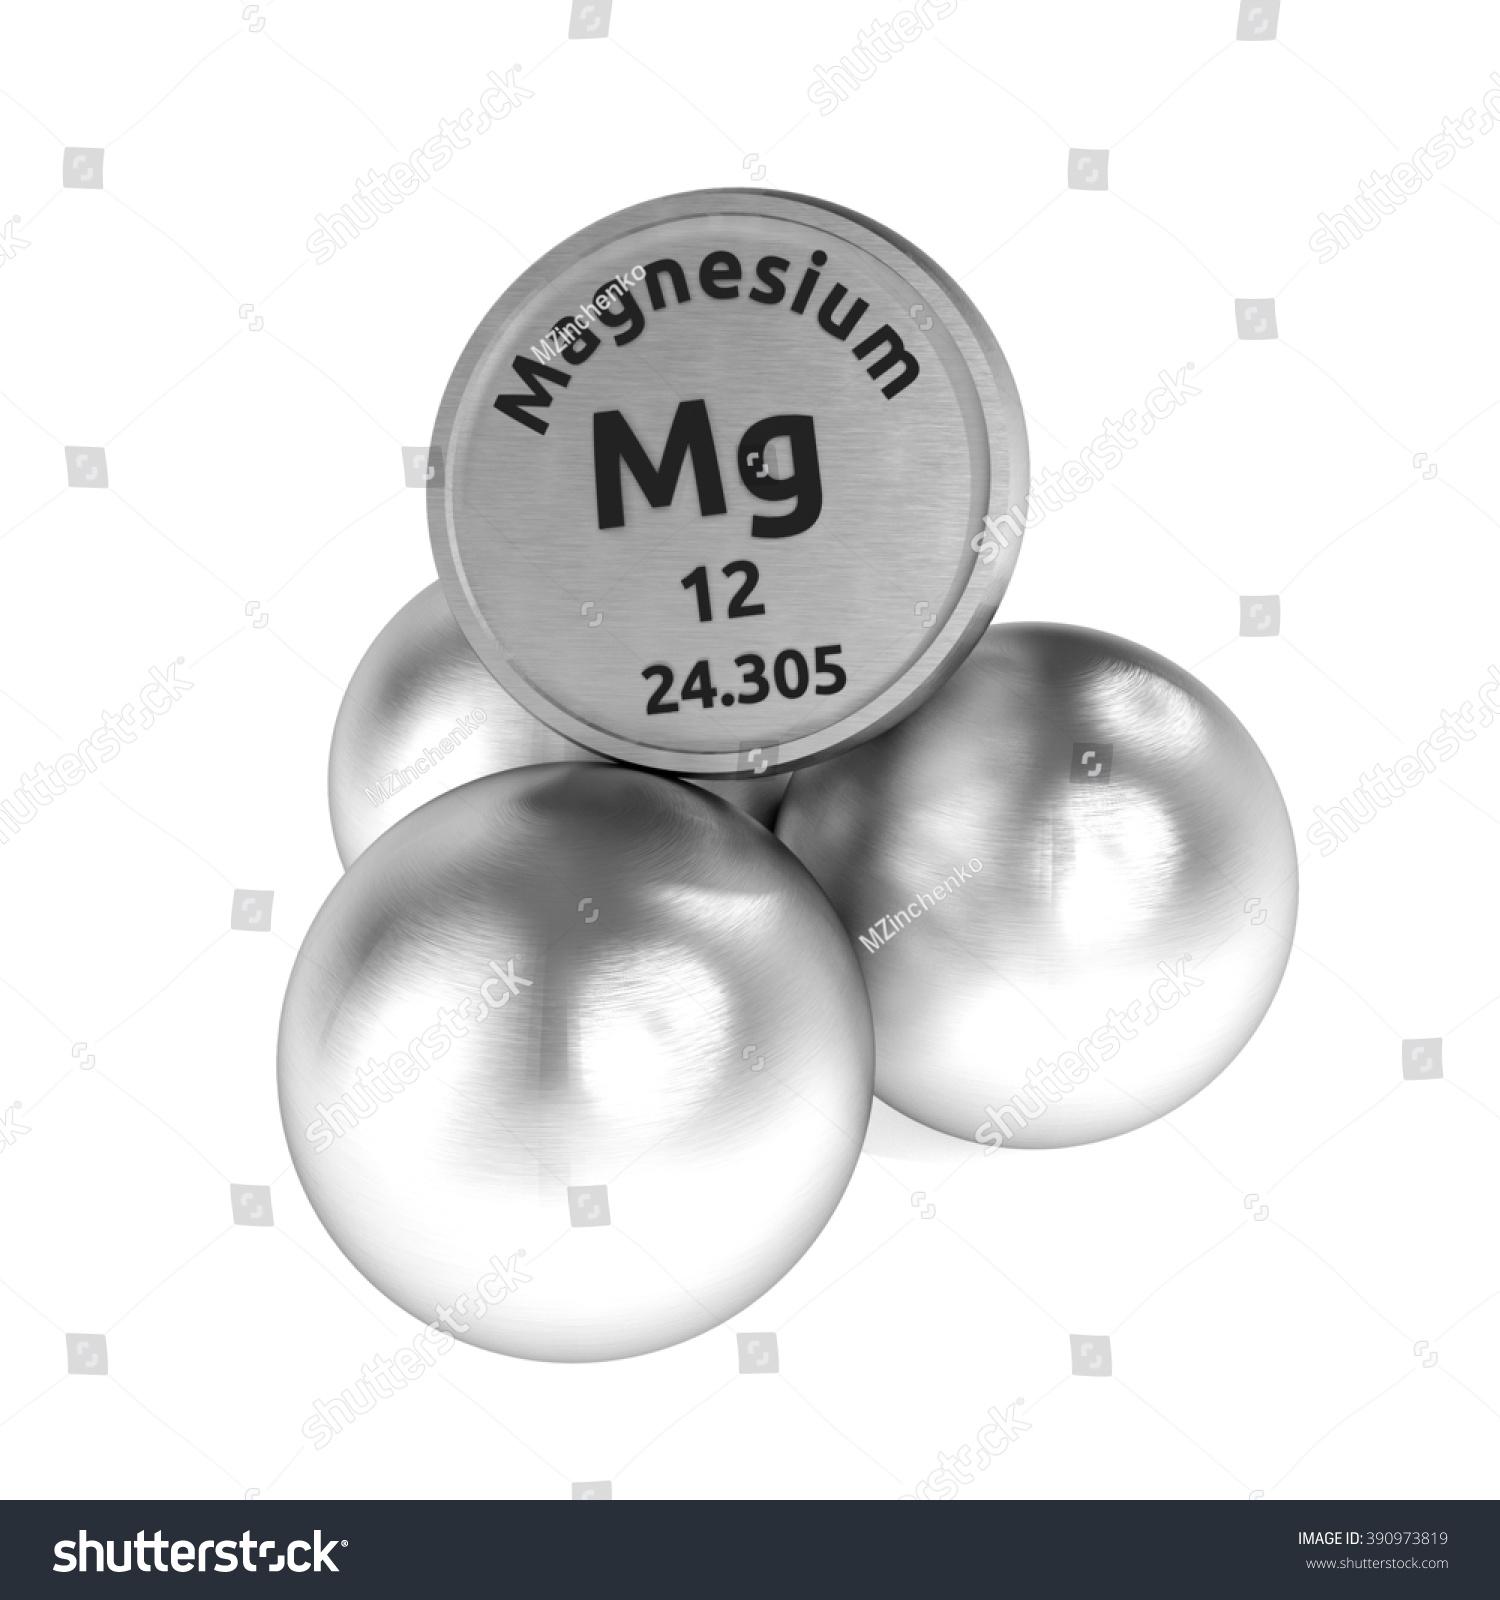 Stock Photo Illustration Magnesium Symbol Sign Of Chemical Element Mg Shutter